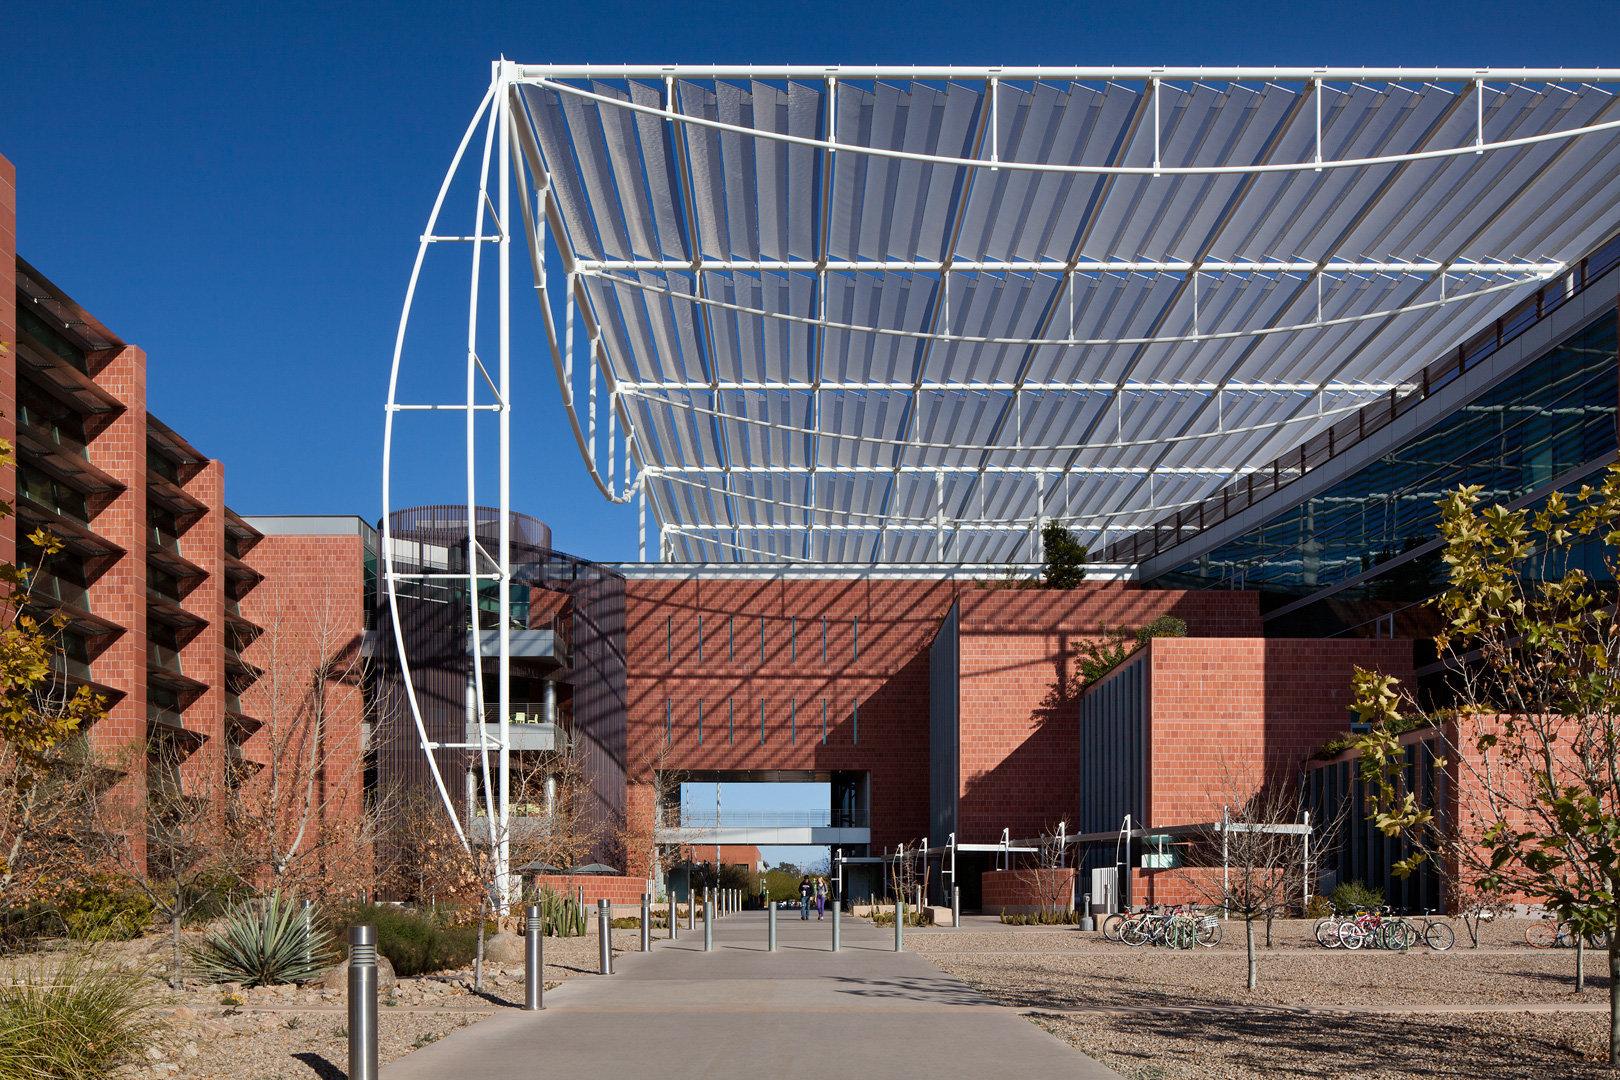 University of Arizona, Keating Bldg